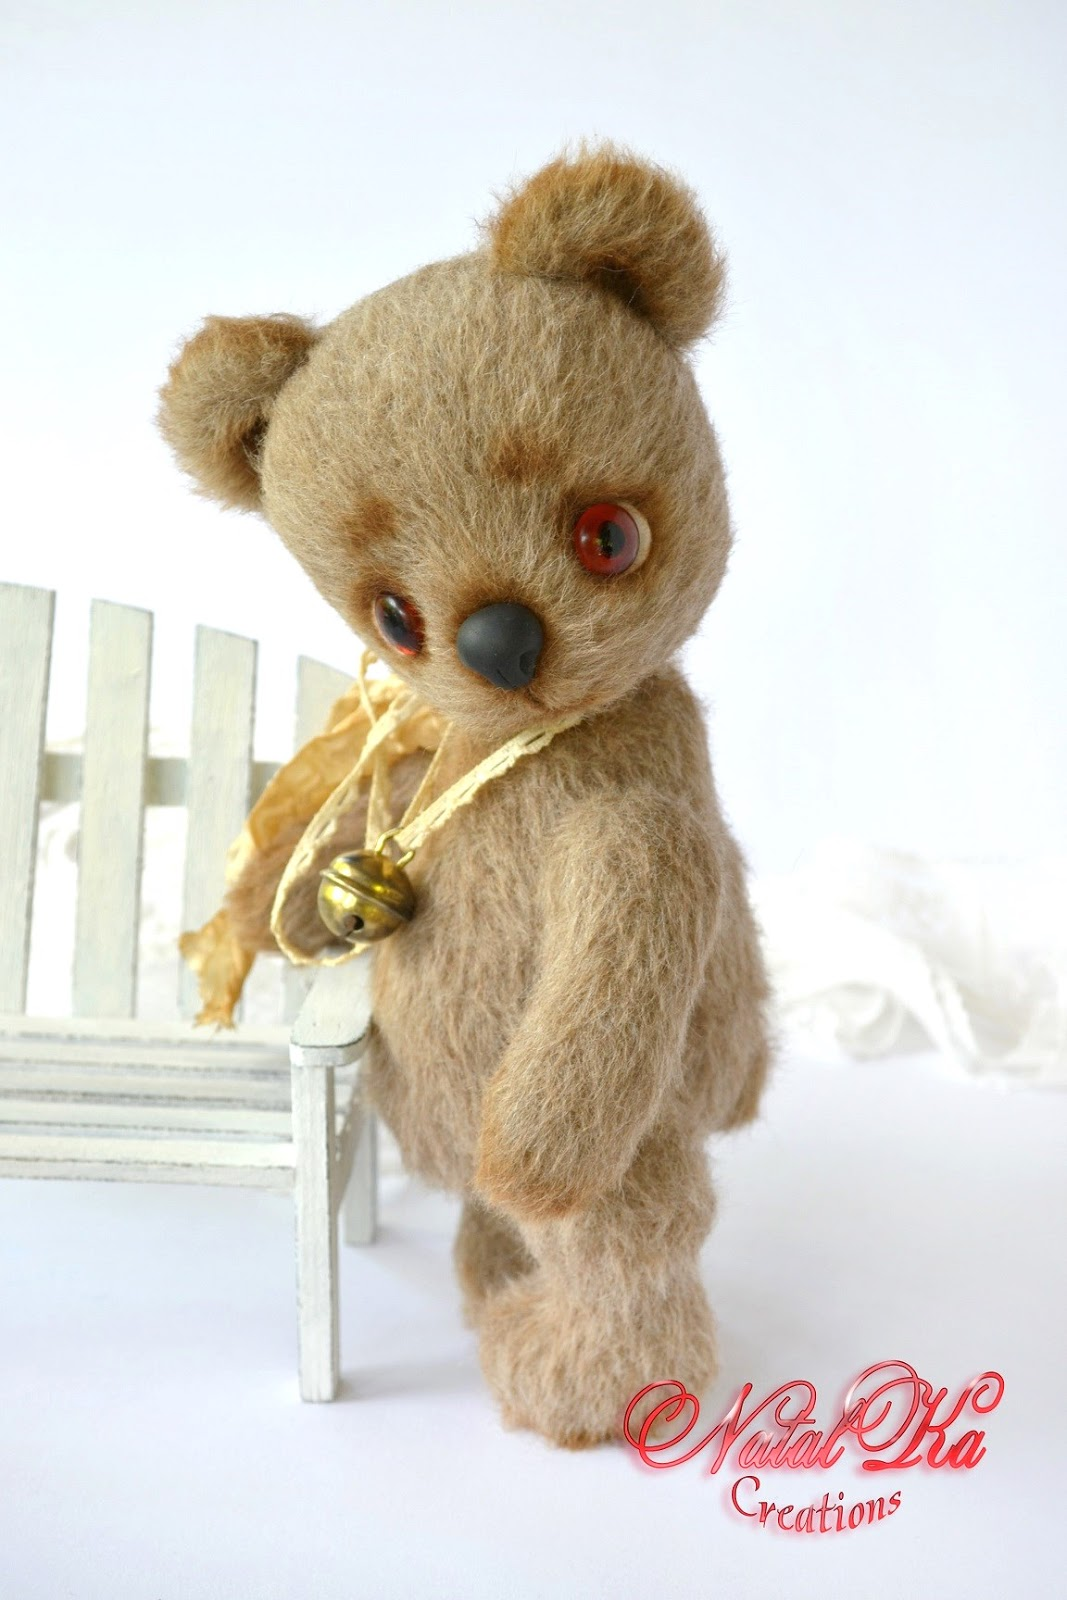 Авторский мишка теди медведь медвежонок из кашемира ручной работы от NatalKa Creations. Künstlerbär Bär Sammlerbär  Teddybär Teddy Unikat handgemacht von NatalKa Creations